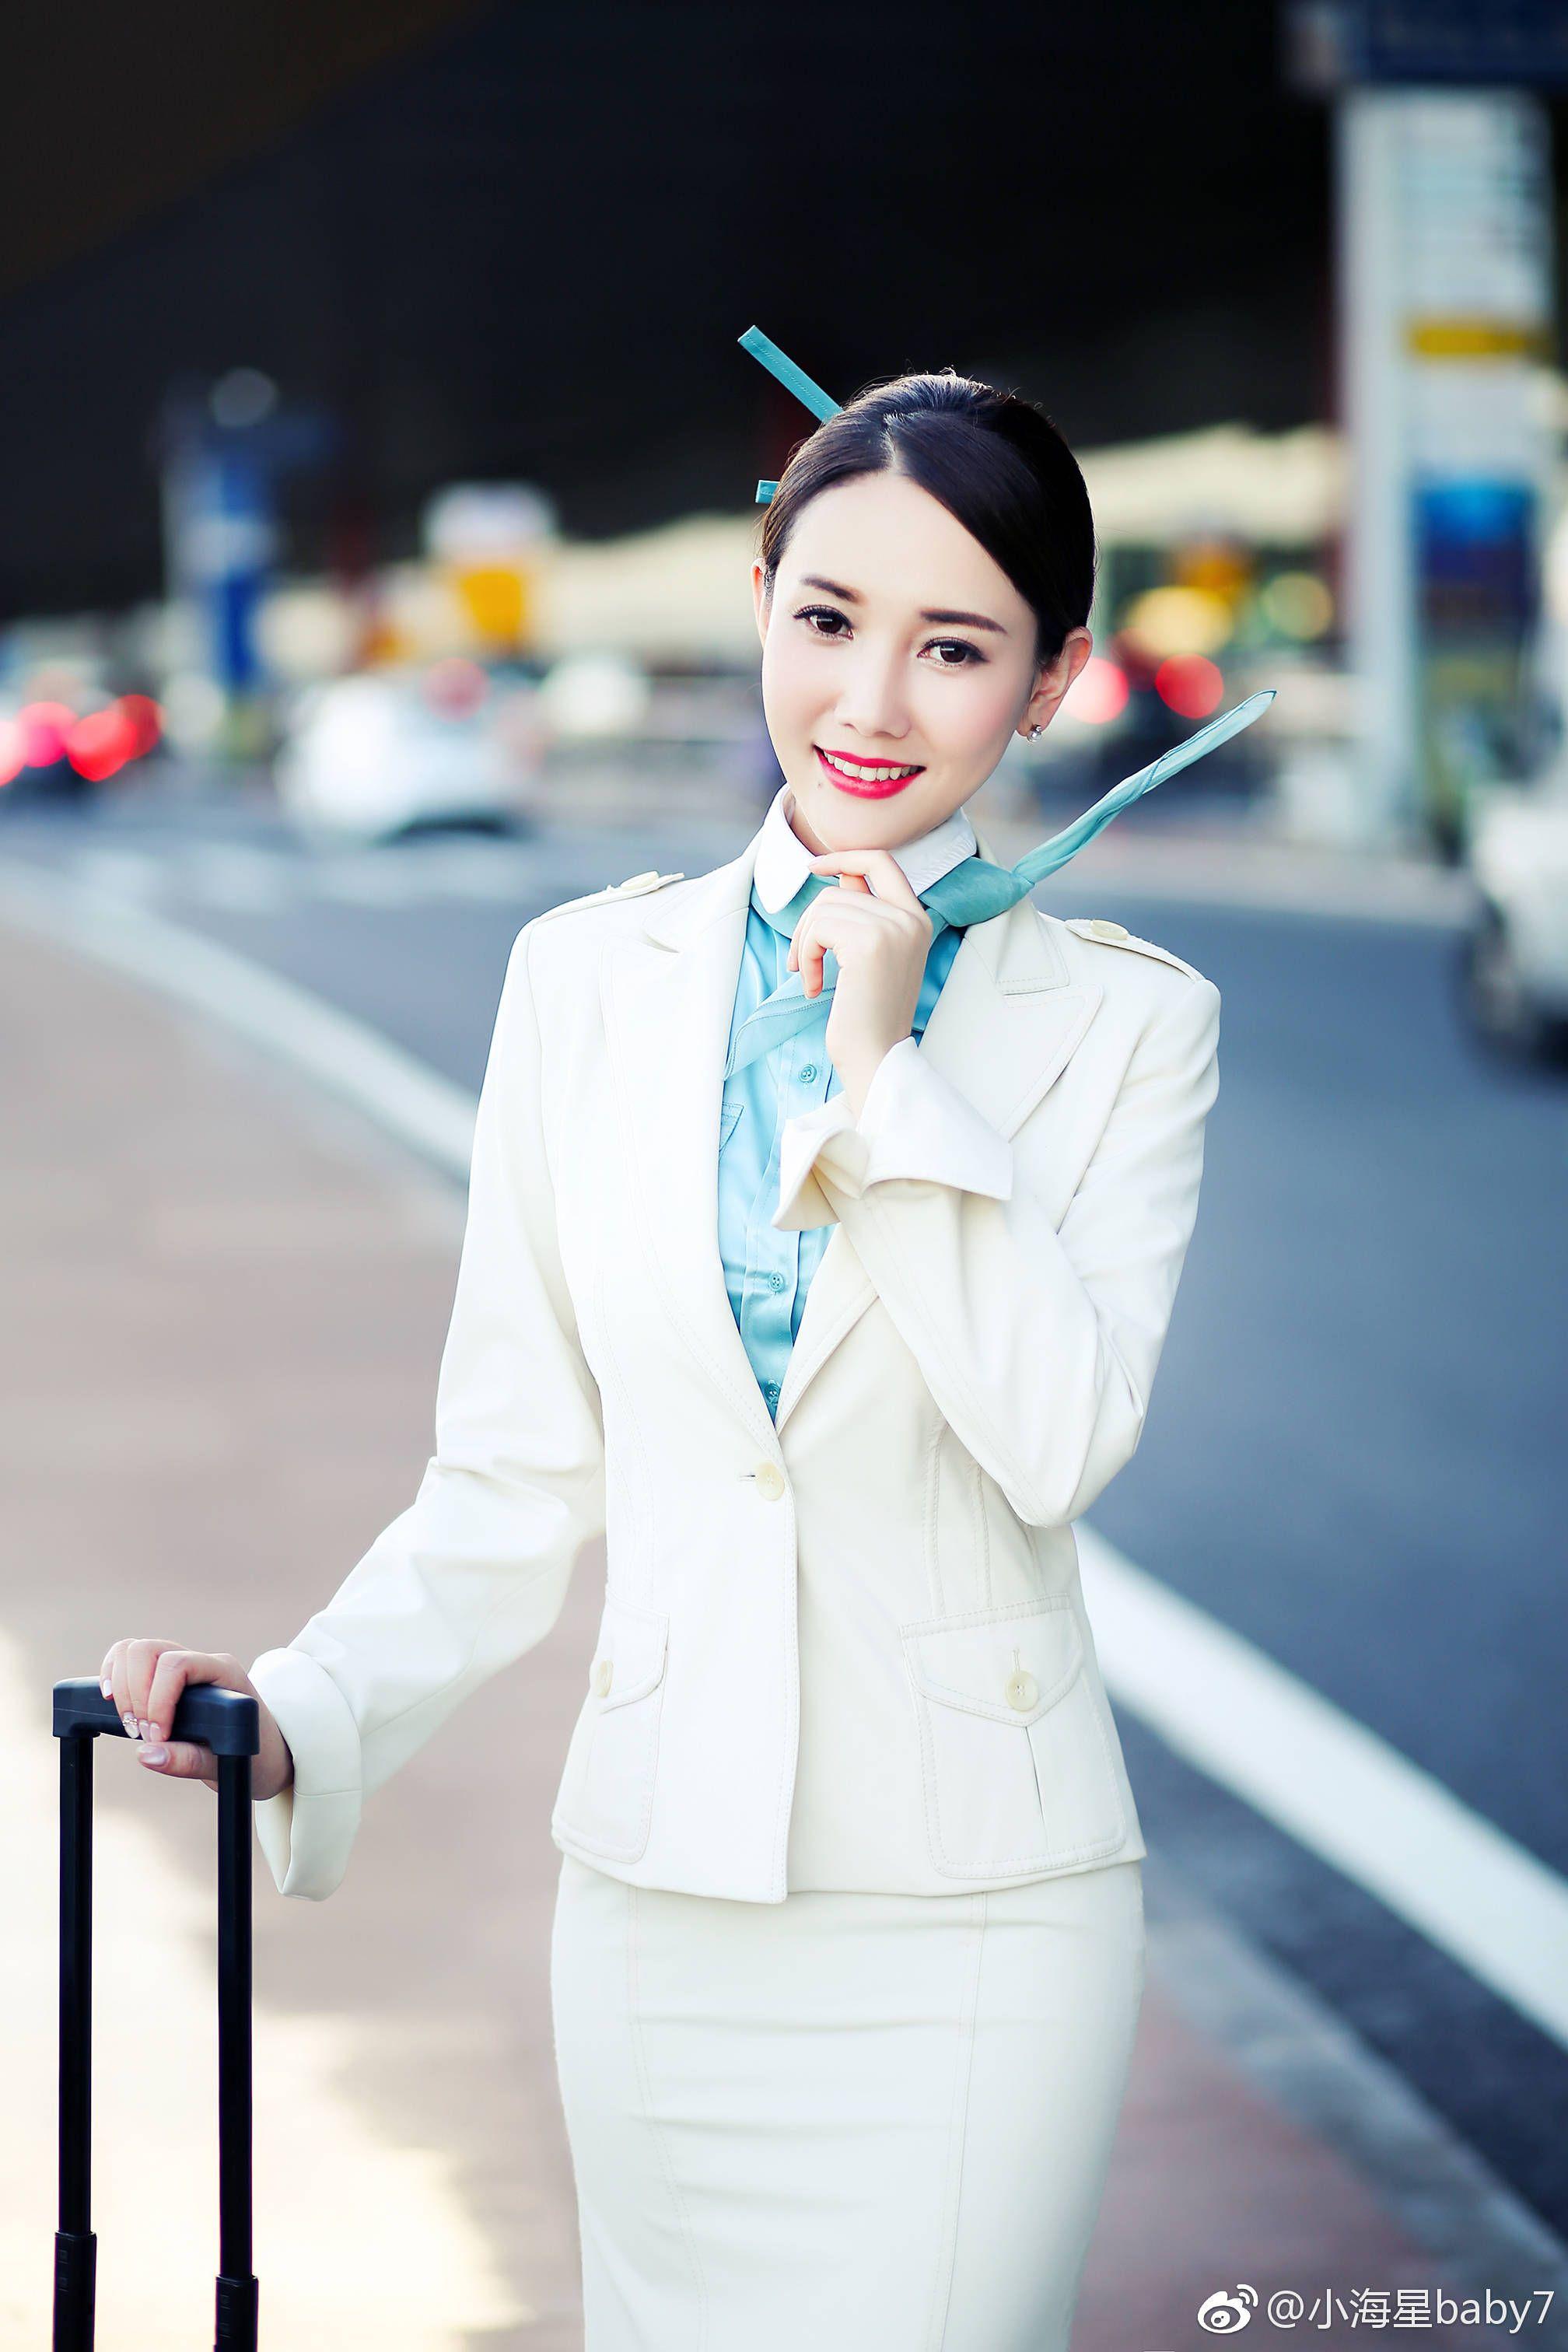 реалити-шоу стюардессы кореи фото независима сражаюсь